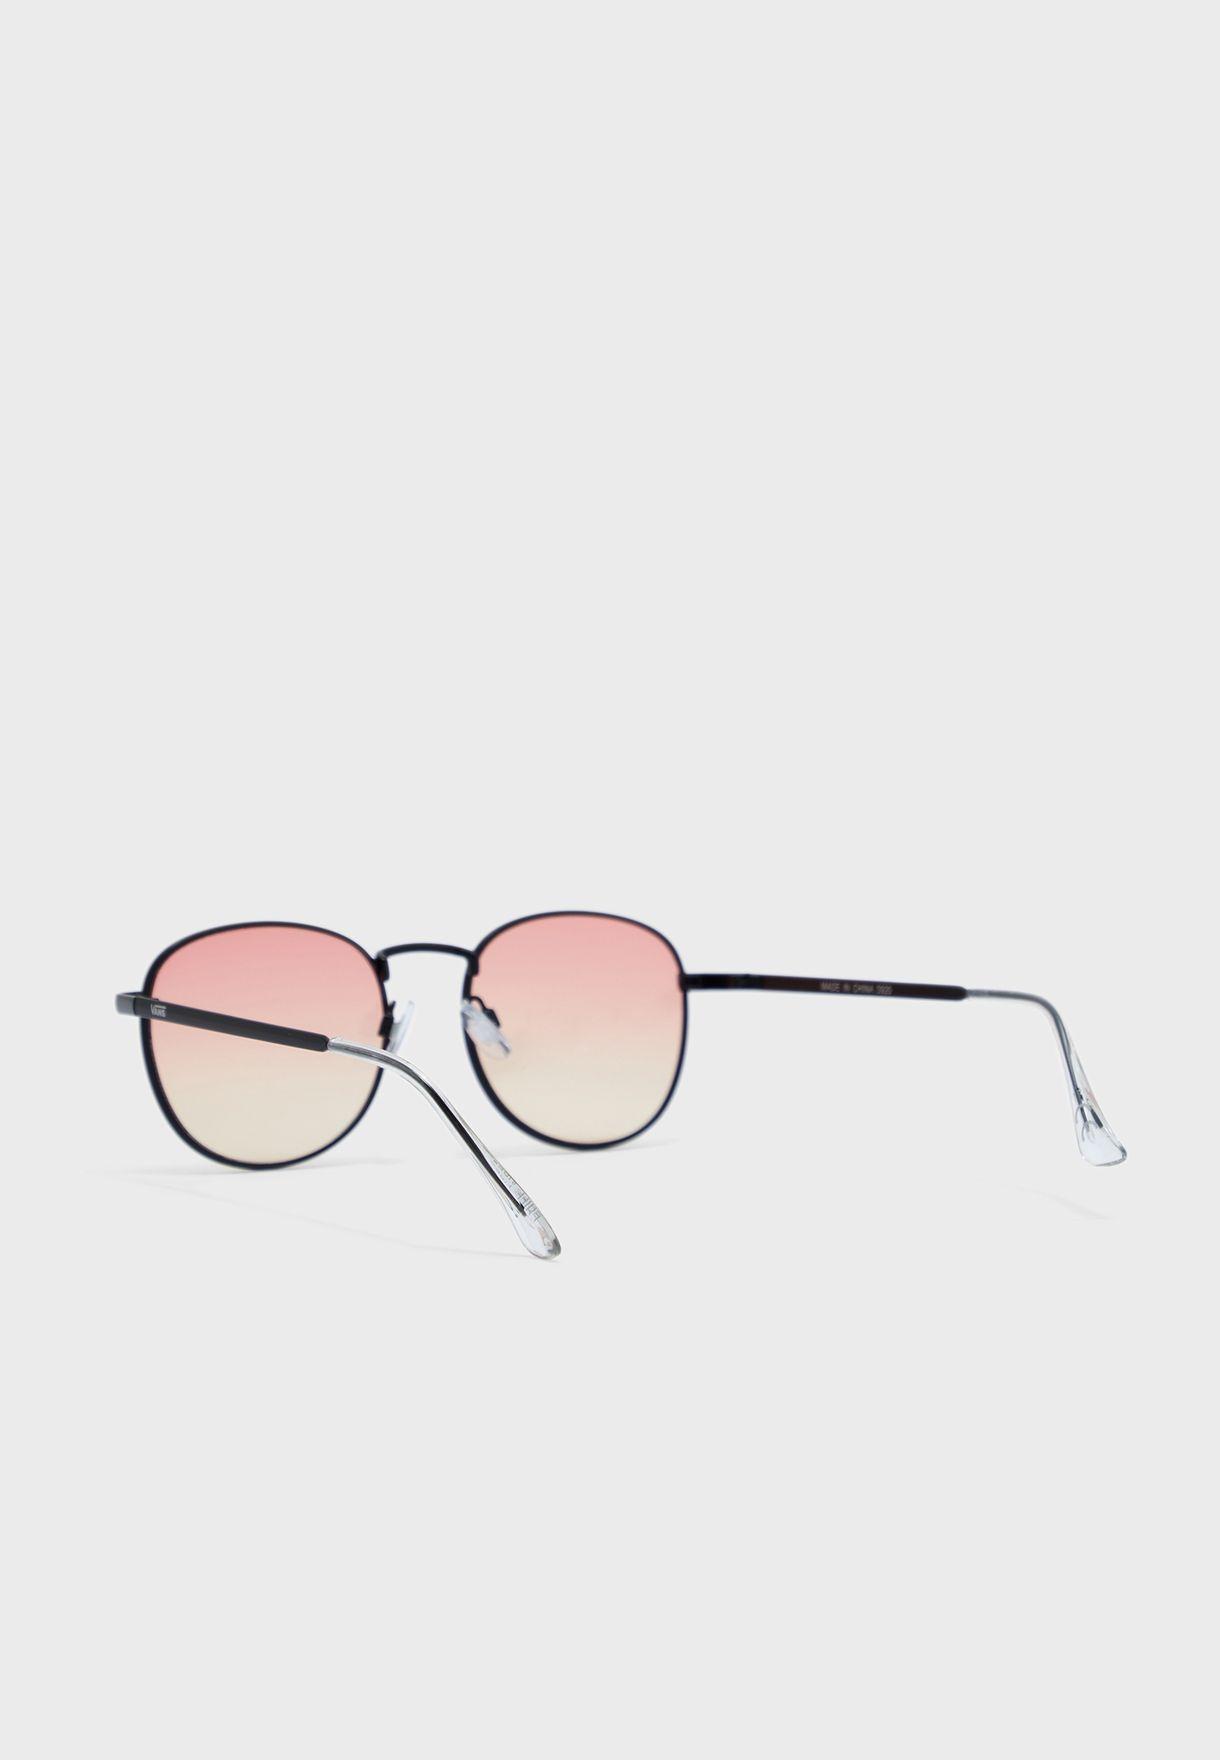 Chill Vibes Sunglasses